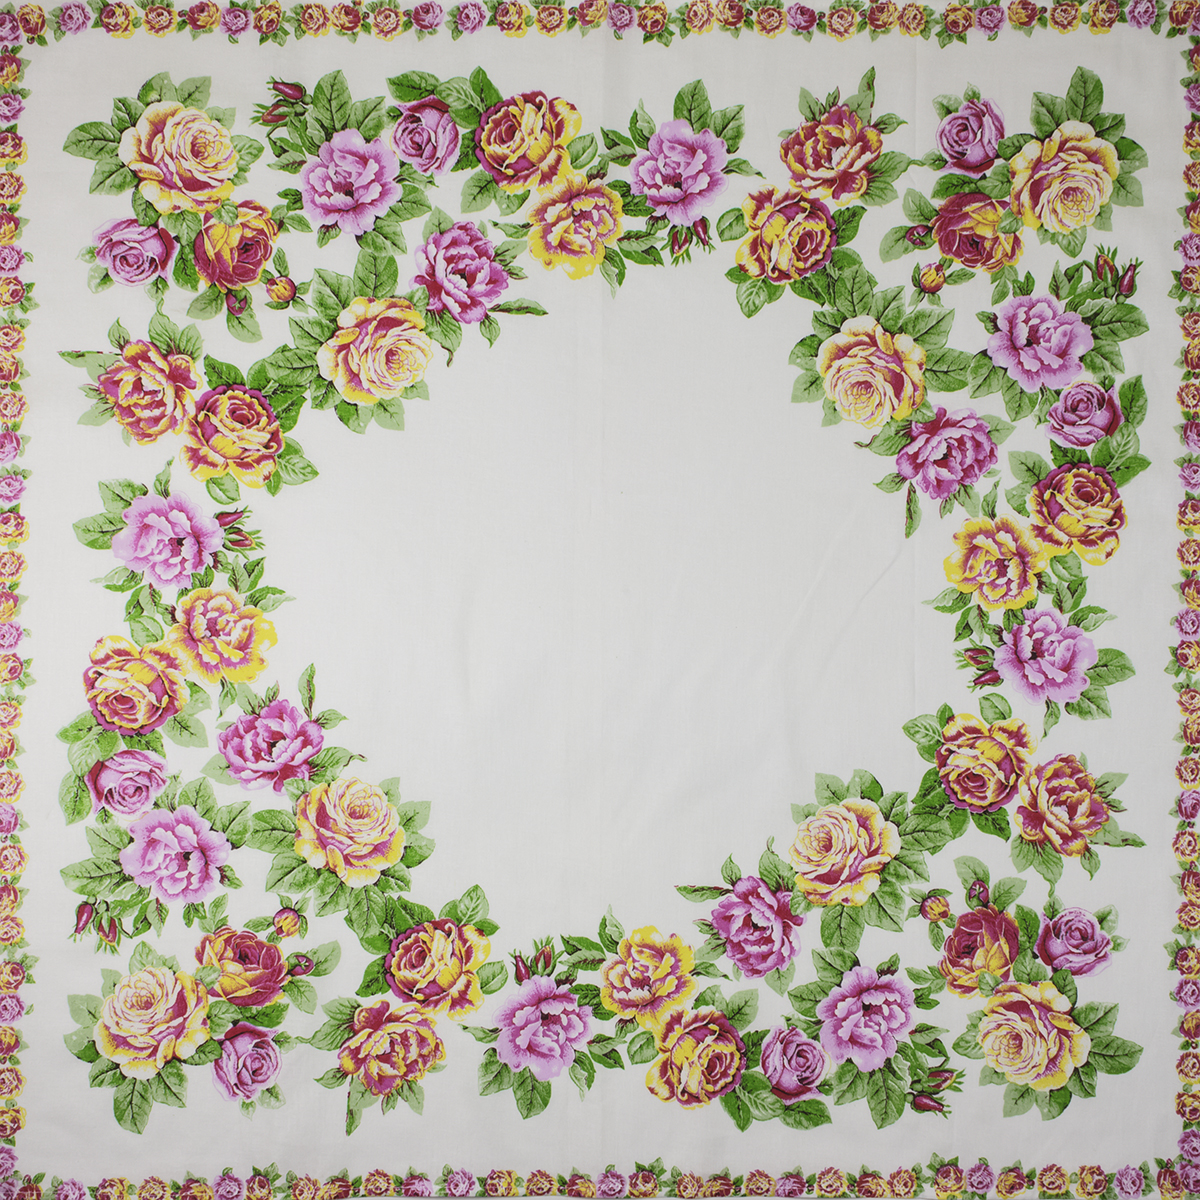 Головной платок Розы, цвет Белый, размер 75х80 смРазные мелочи<br><br><br>Тип: -<br>Размер: 75х80<br>Материал: Ситец